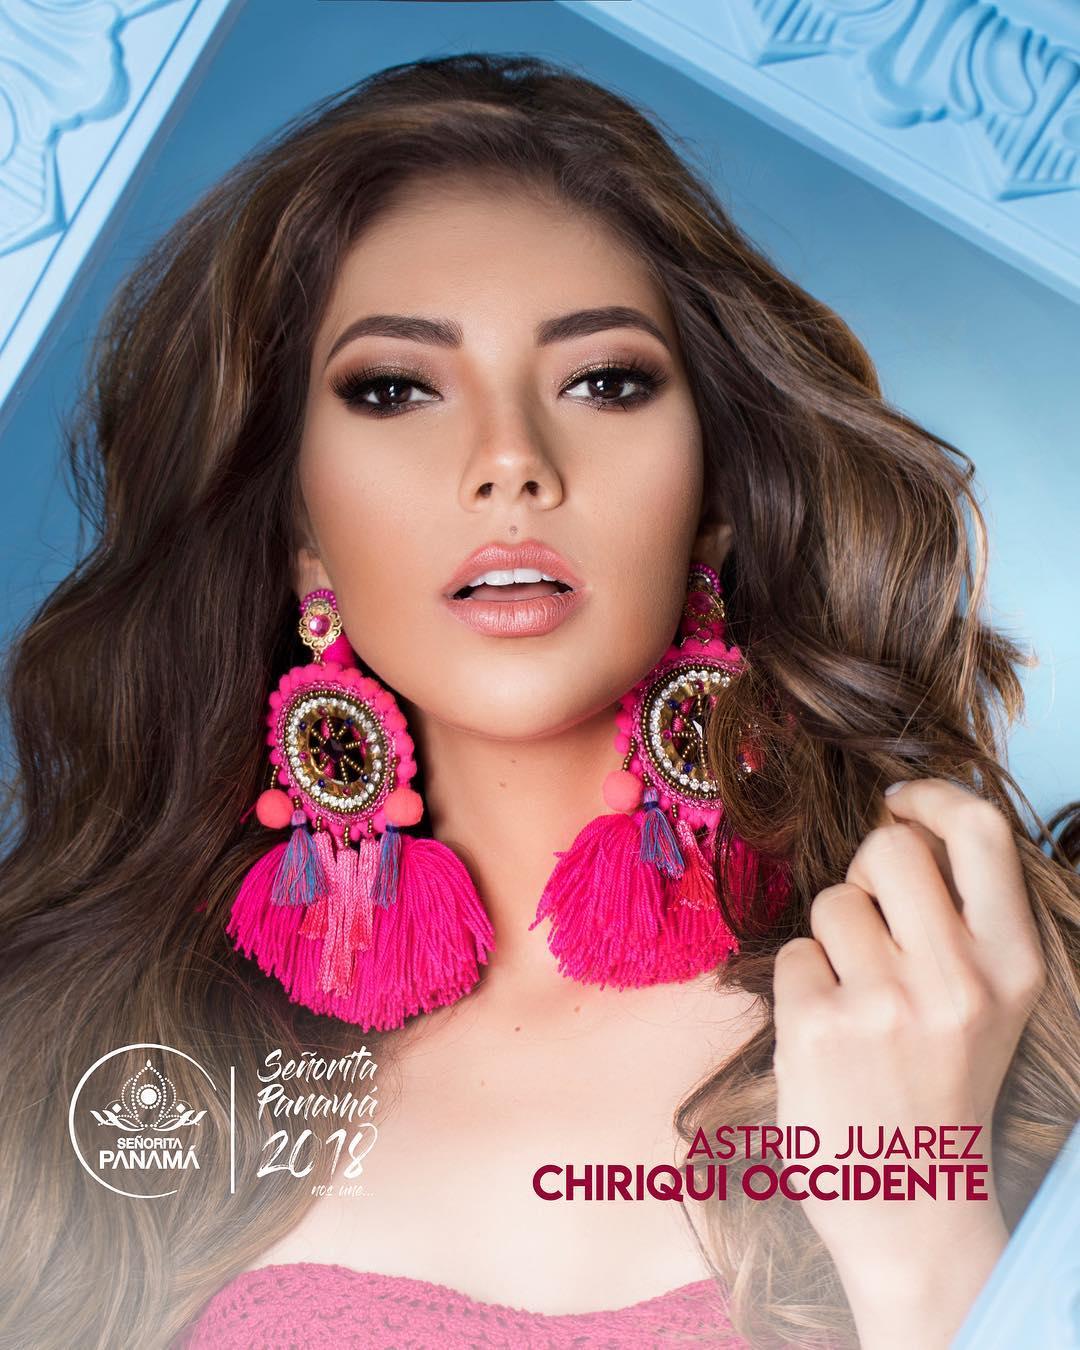 señorita miss colombia 2018 candidates candidatas contestants delegates Miss Chiriquí Occidente Astrid Juárez